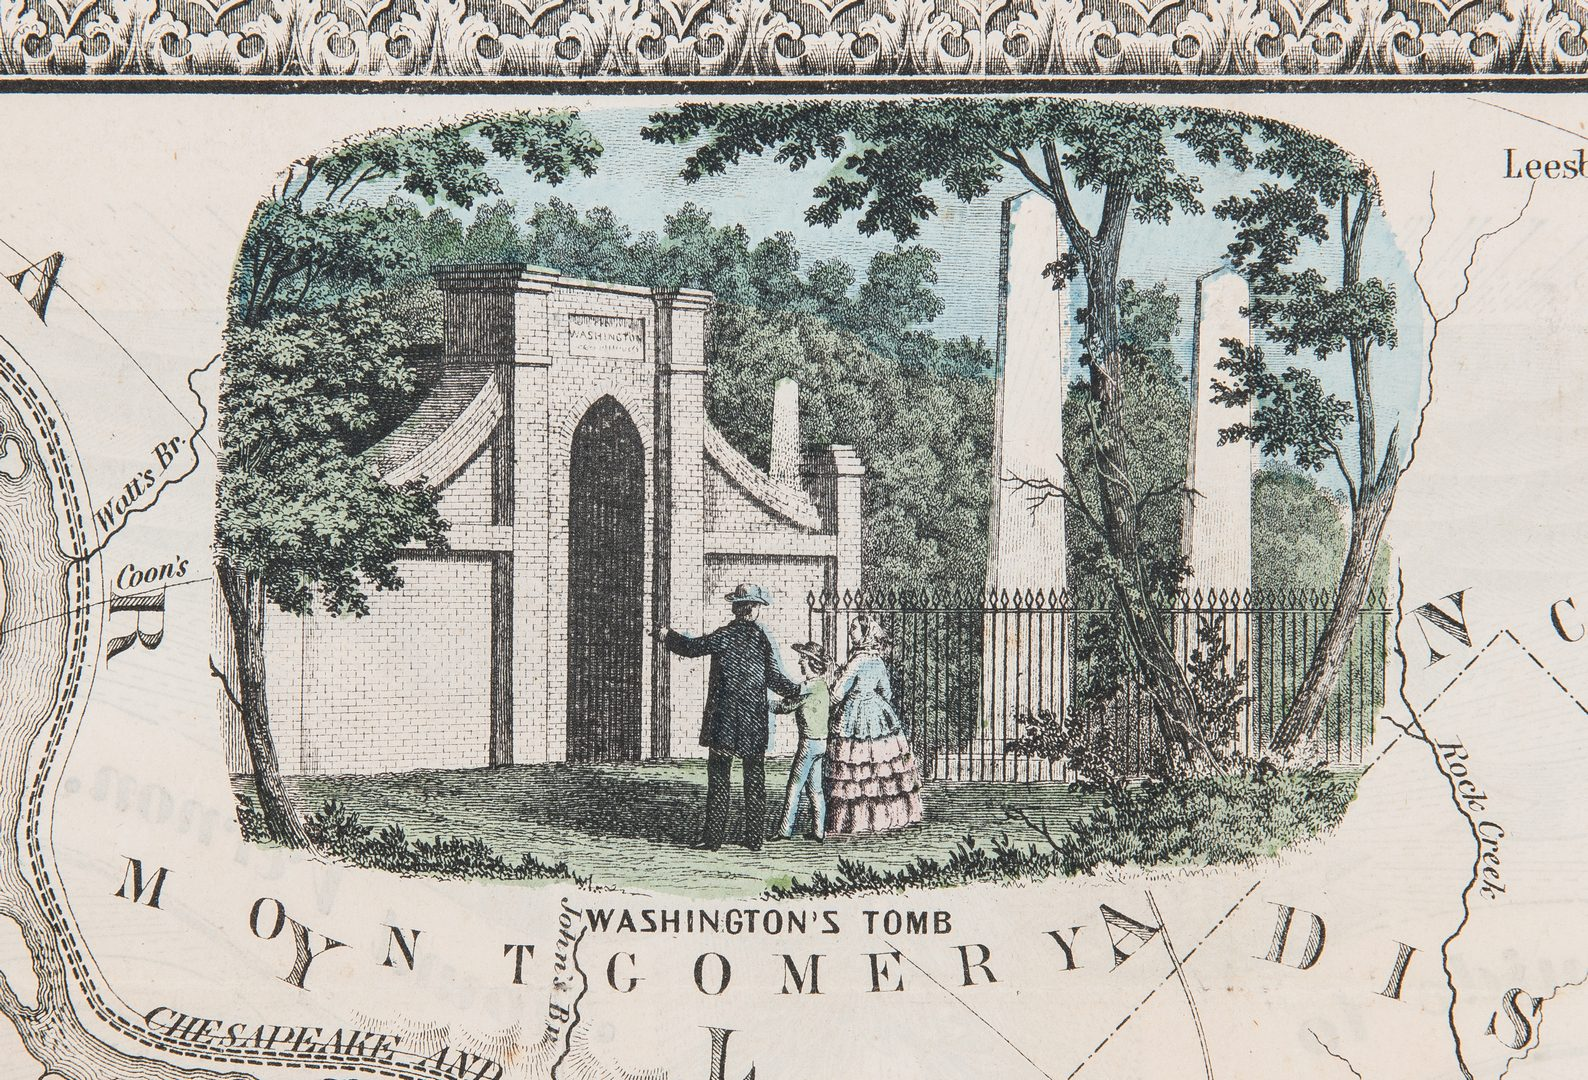 Lot 343: Alexandria, VA map by James Tuthill